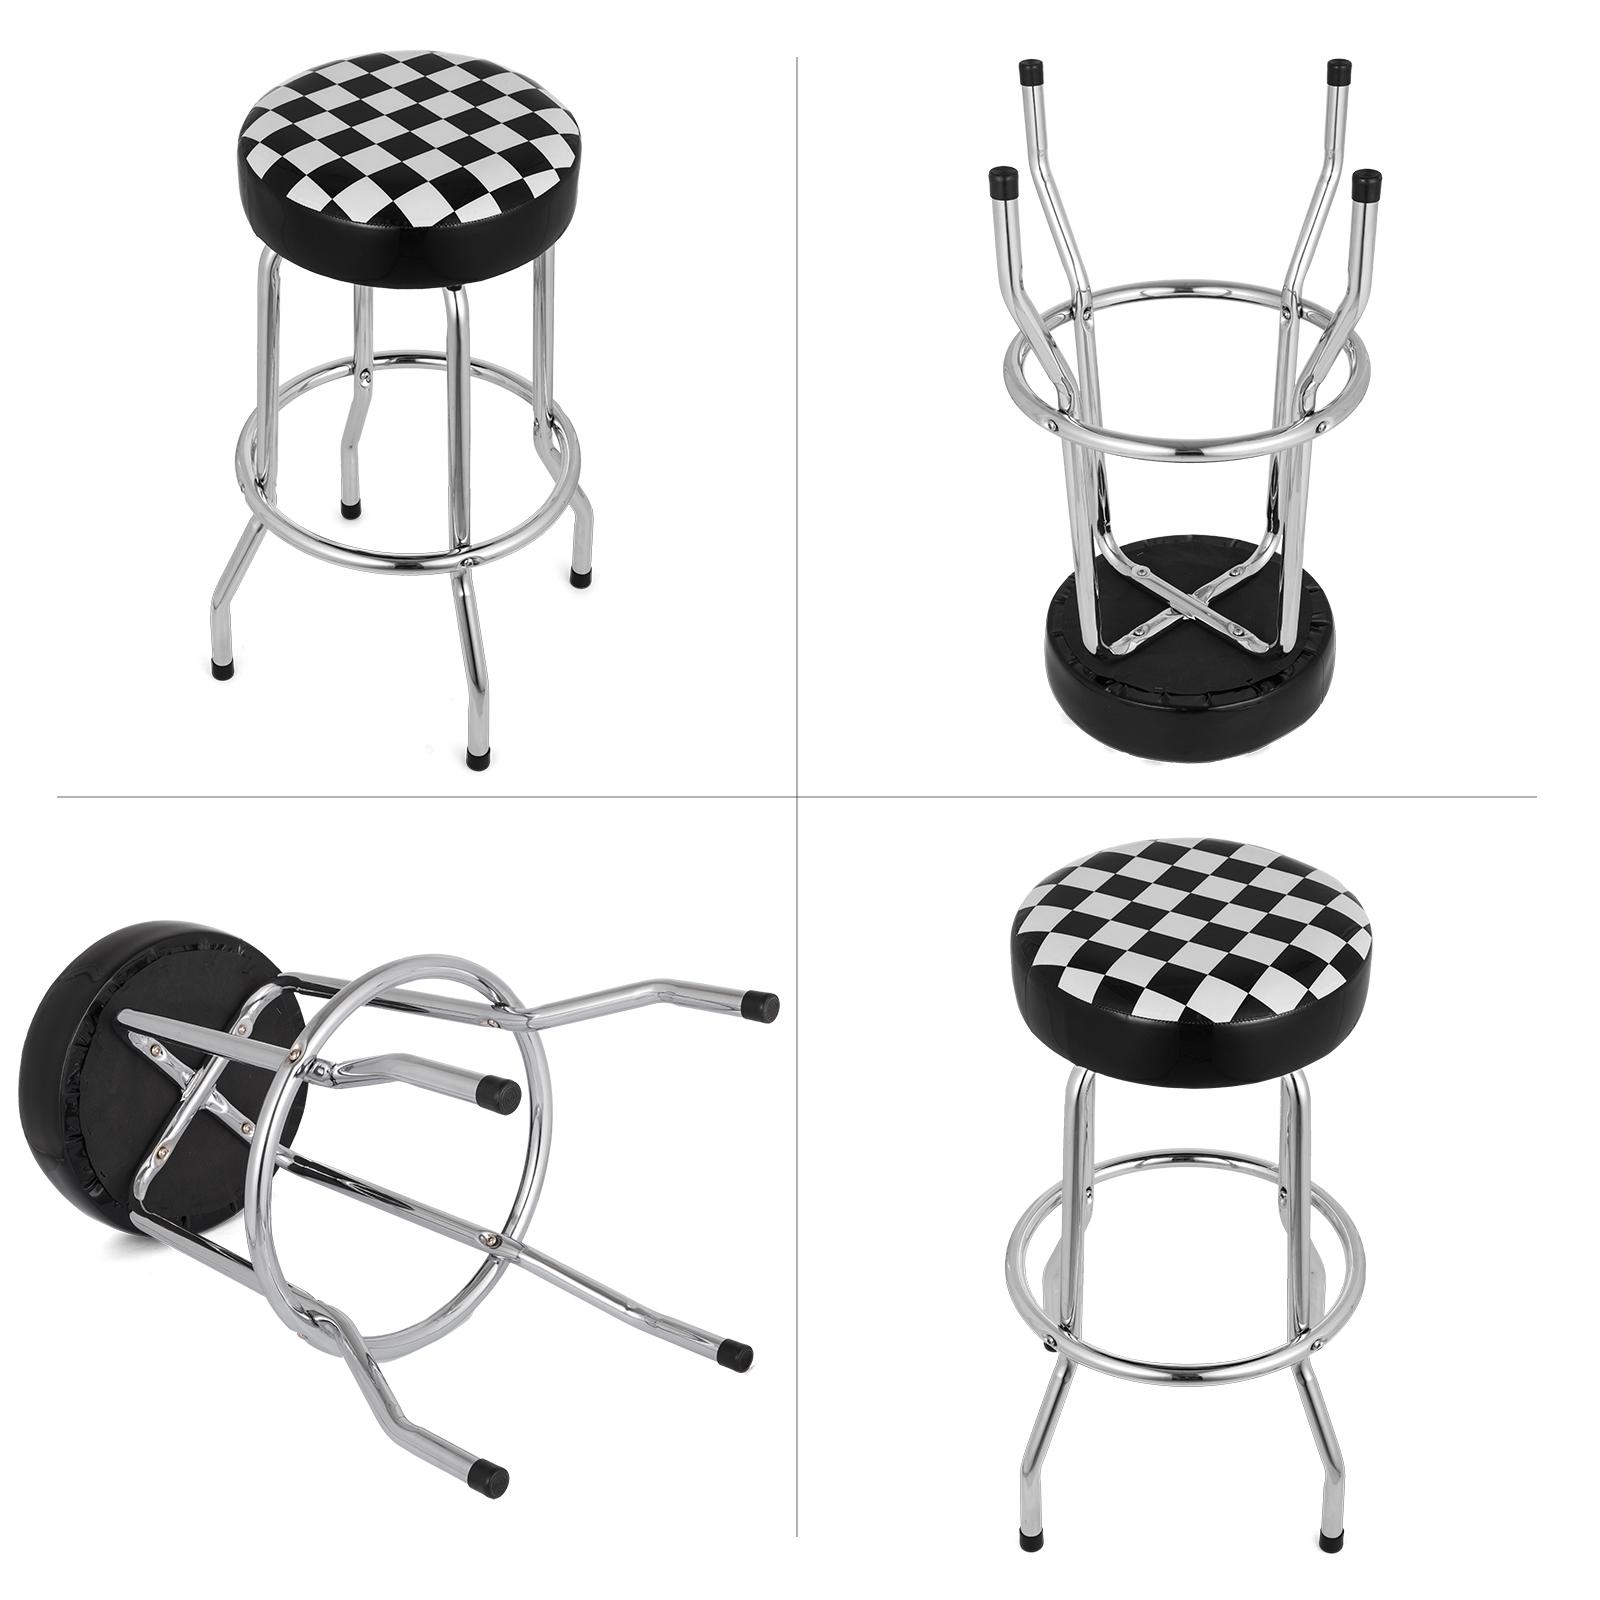 Astonishing Shop Stool With Checkered Flag Design Adjustable Height Ibusinesslaw Wood Chair Design Ideas Ibusinesslaworg